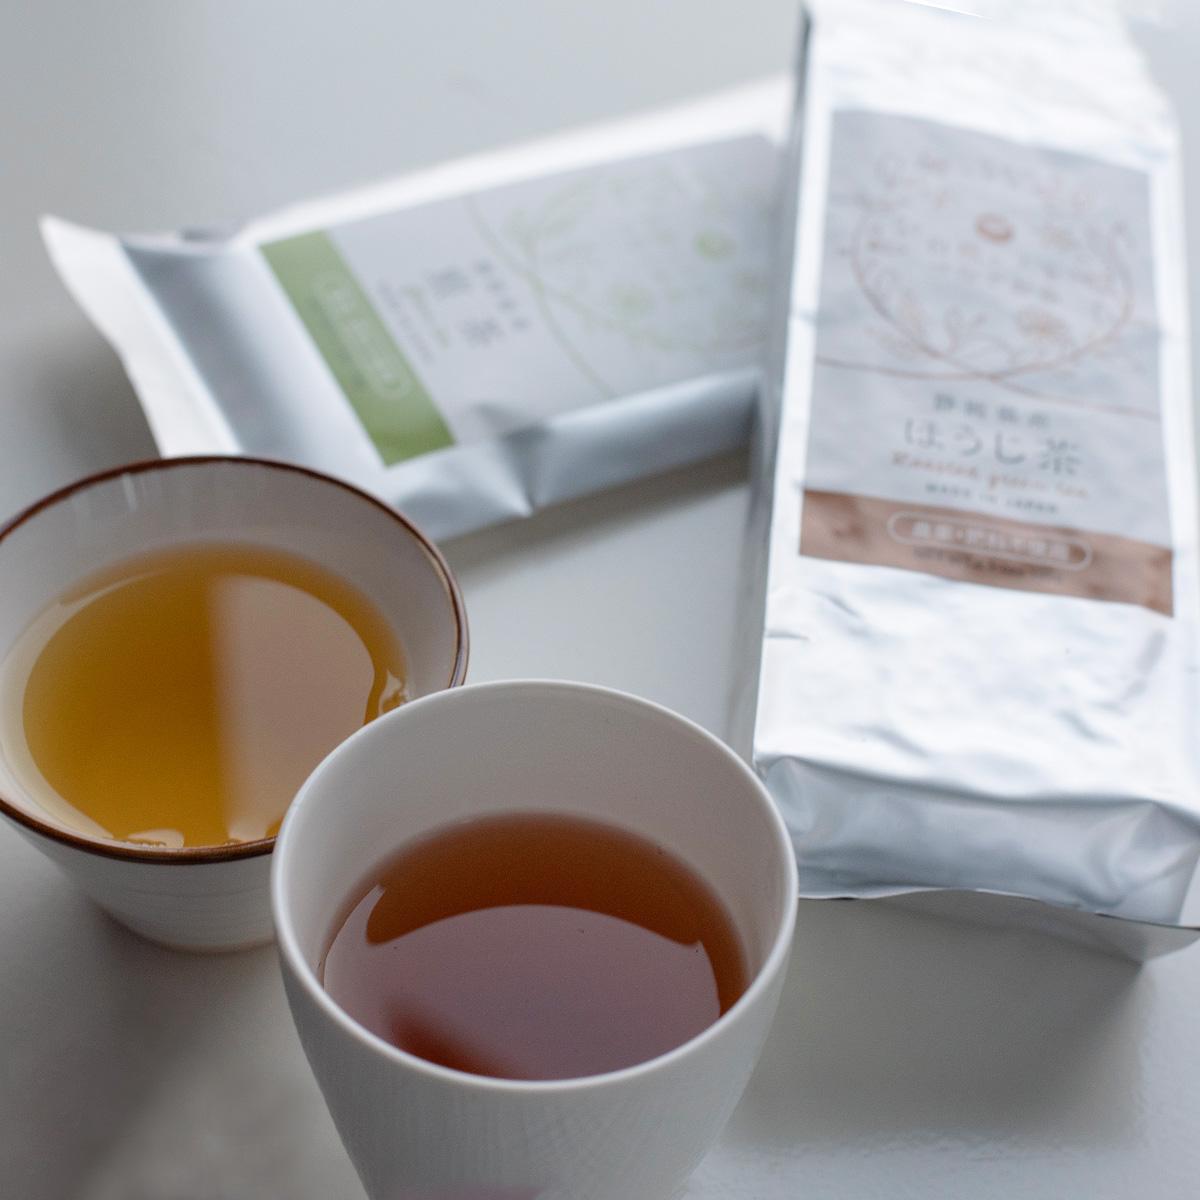 OrganicGarden 農薬・肥料不使用 自然と人をつなぐお茶 自然栽培お茶セット4種〔100g×3・70g×1〕